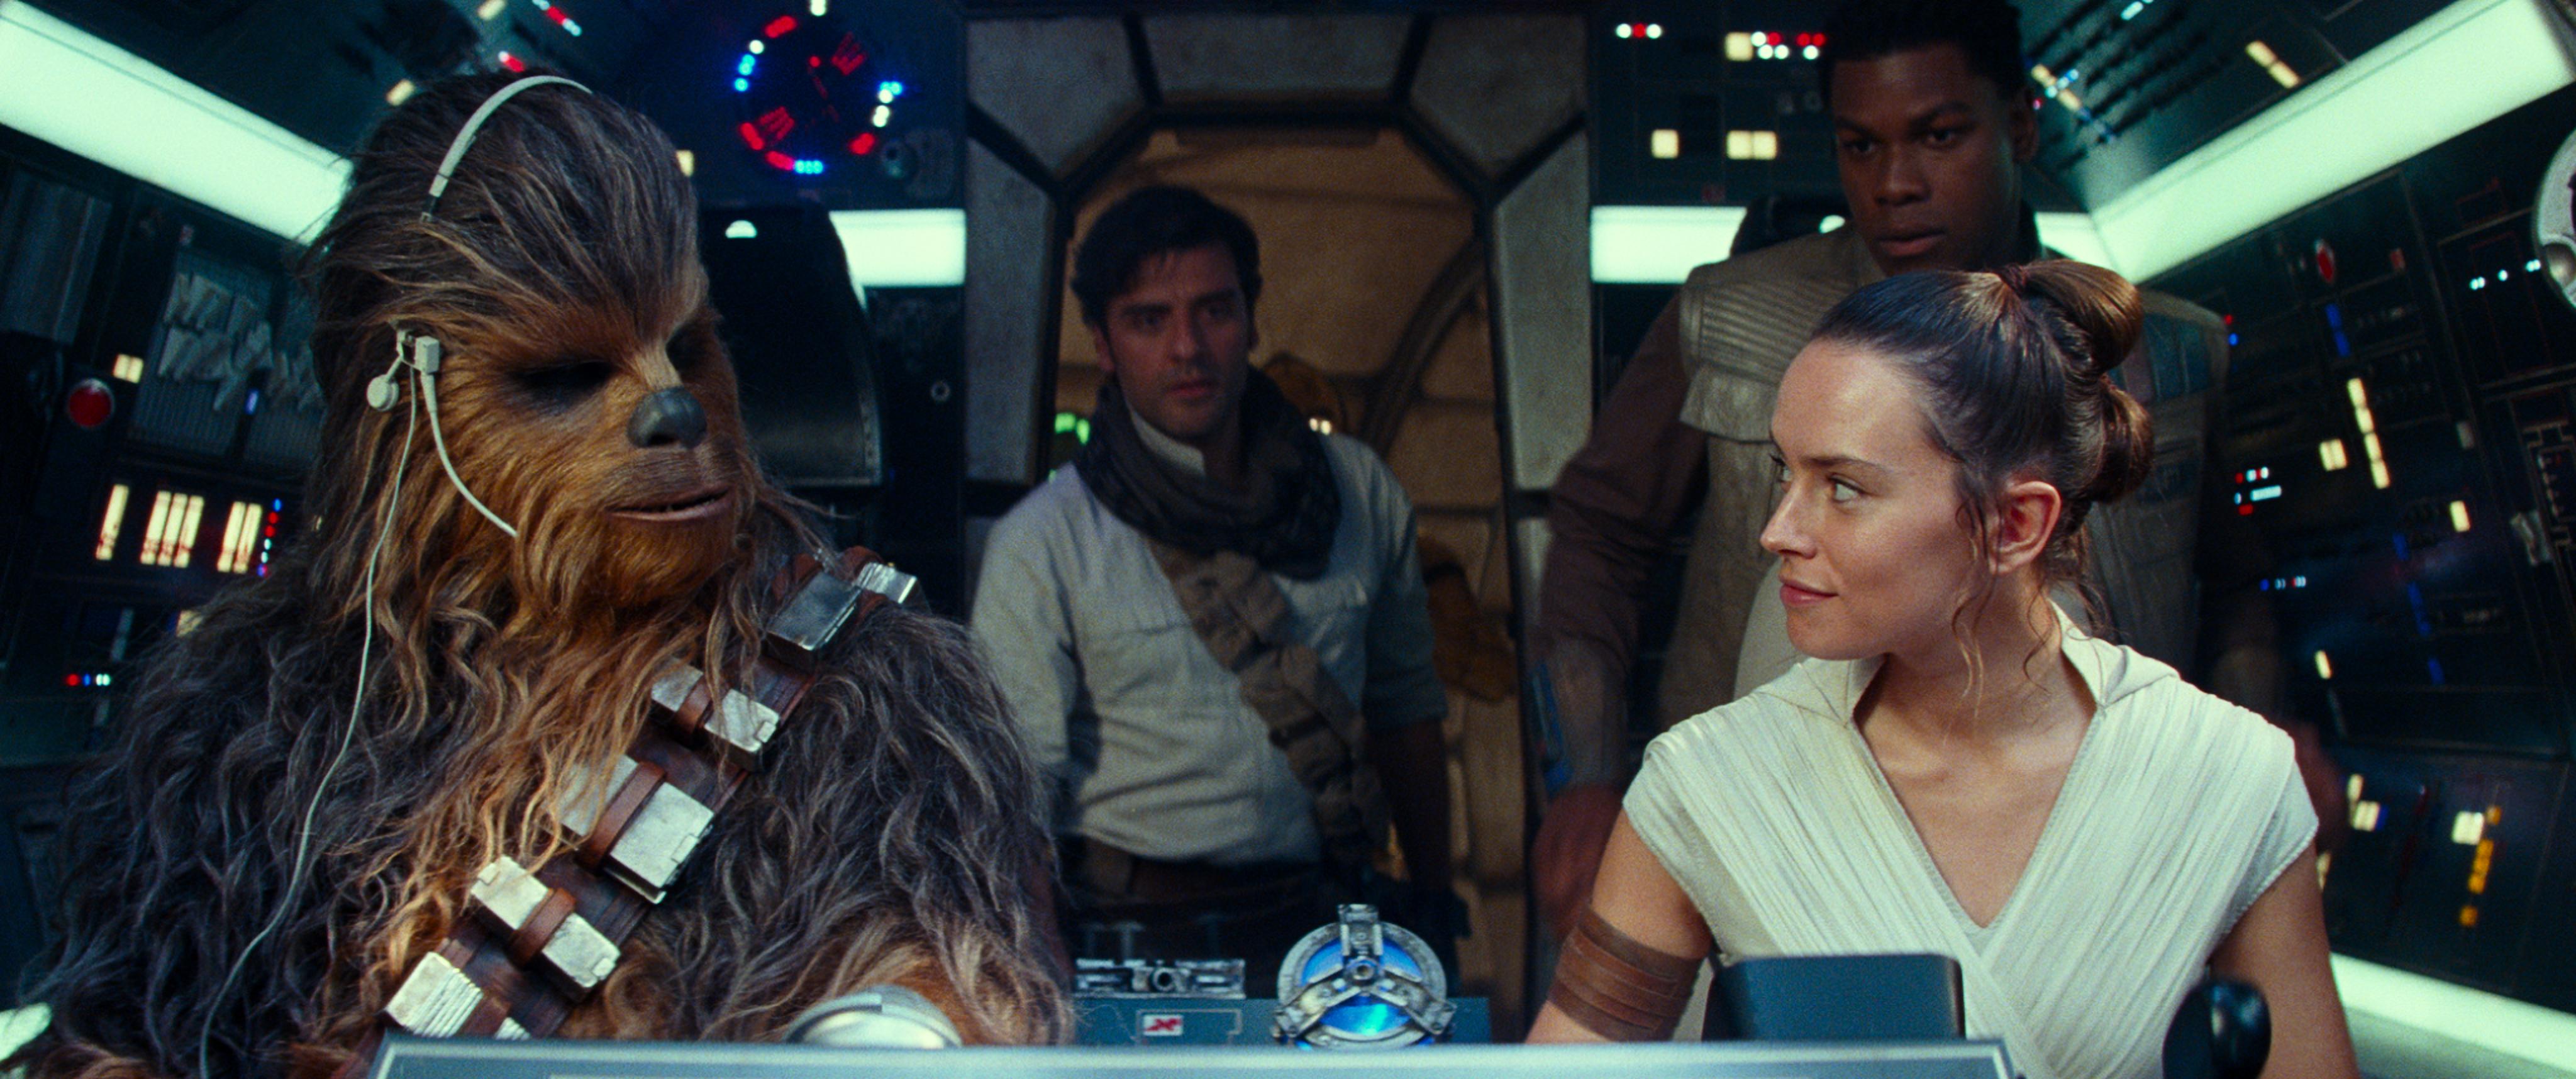 Chewbacca (Joonas Suotamo), Rey (Daisy Ridley), Finn (John Boyega) junto a Poe Dameron (Isaac) en la nave Millenium Falcon.